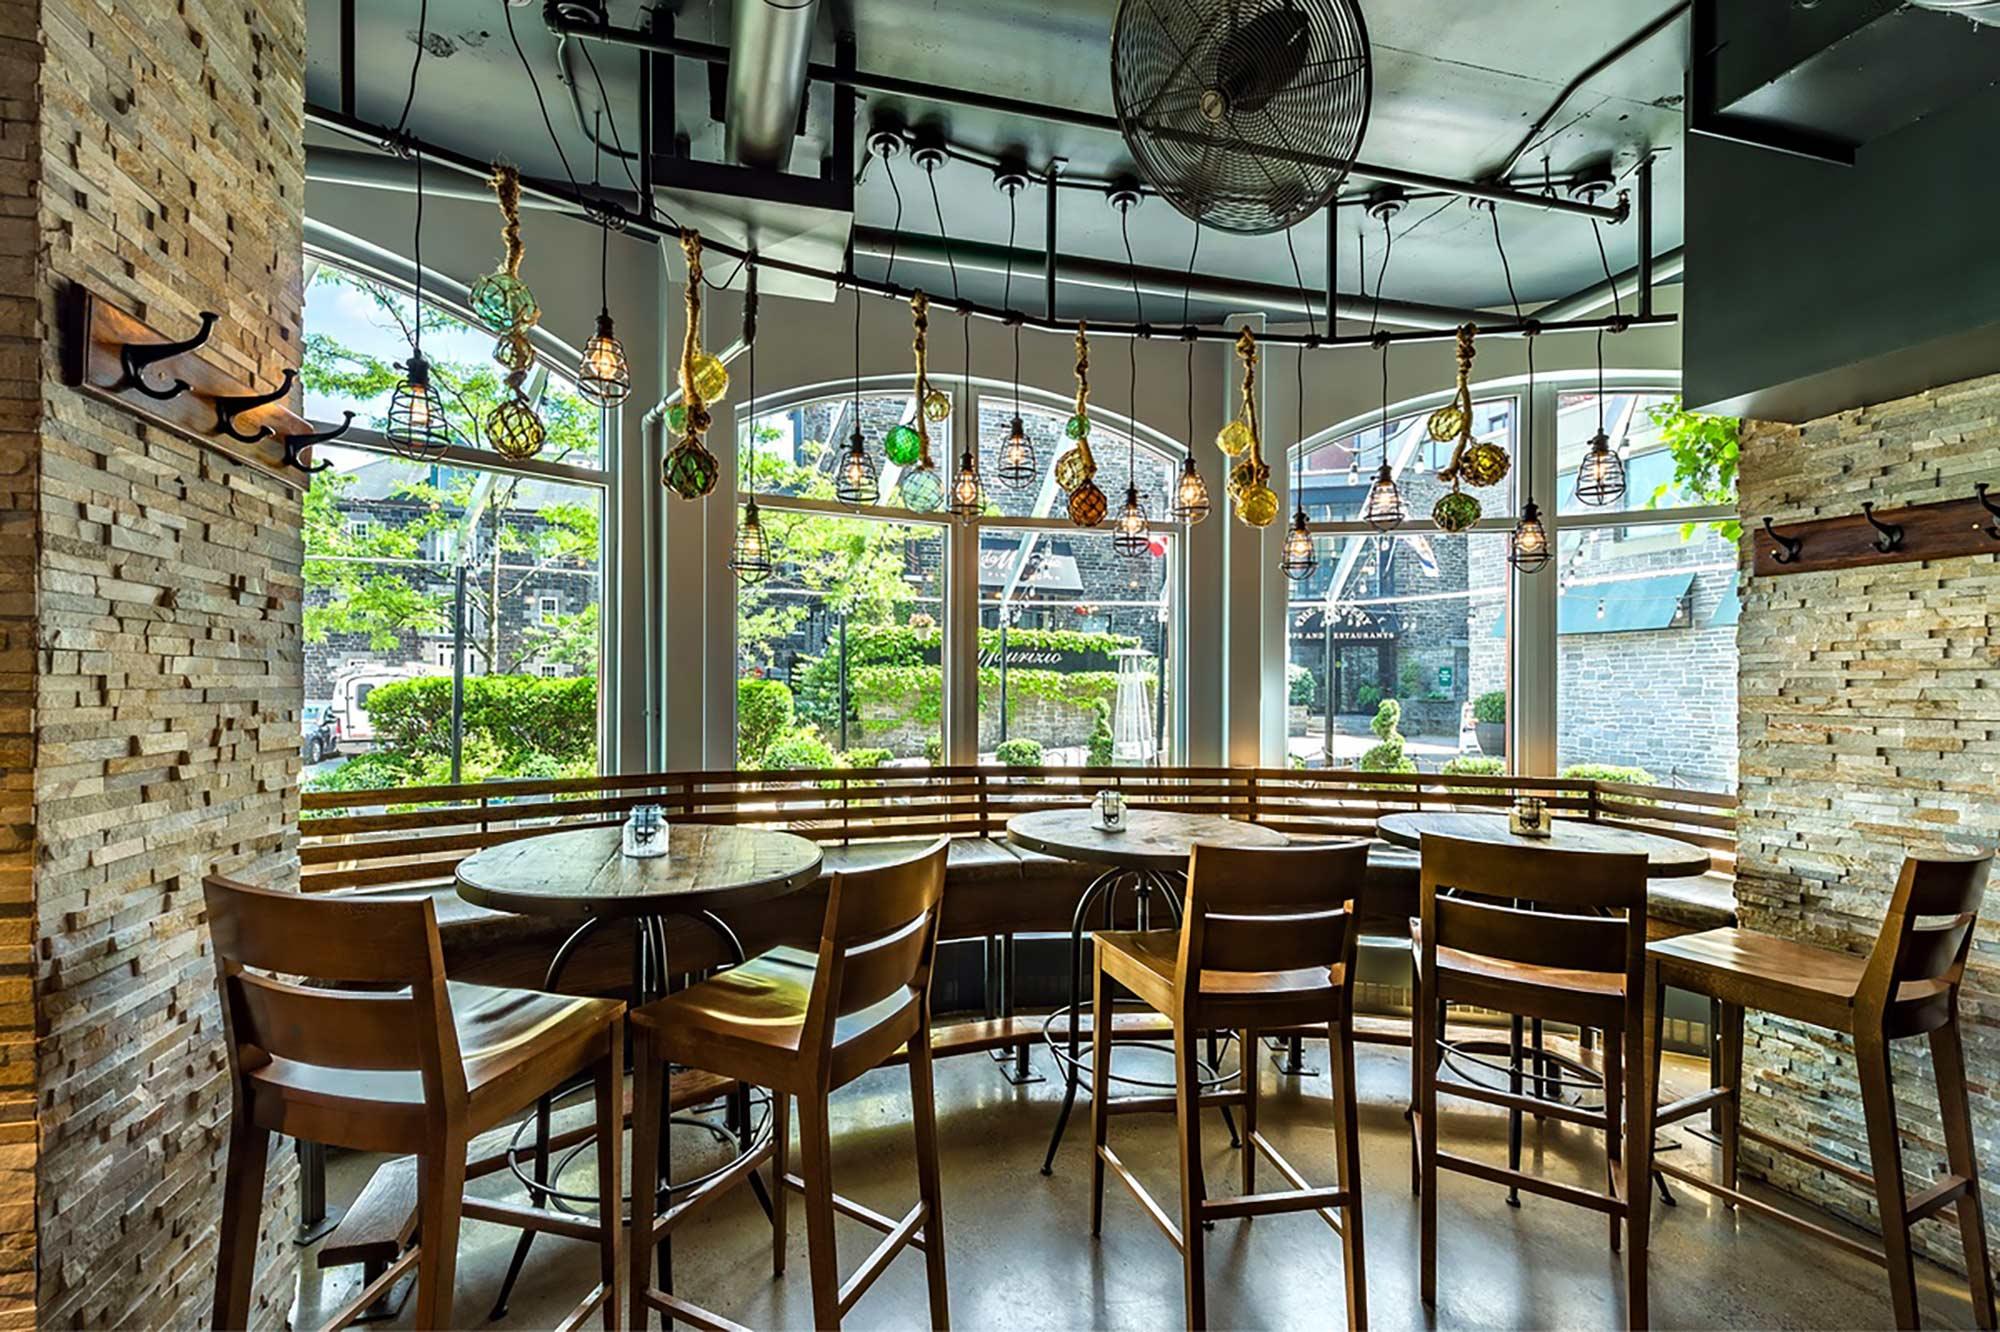 interior-design-seafood-restuarant-window-seating.jpg